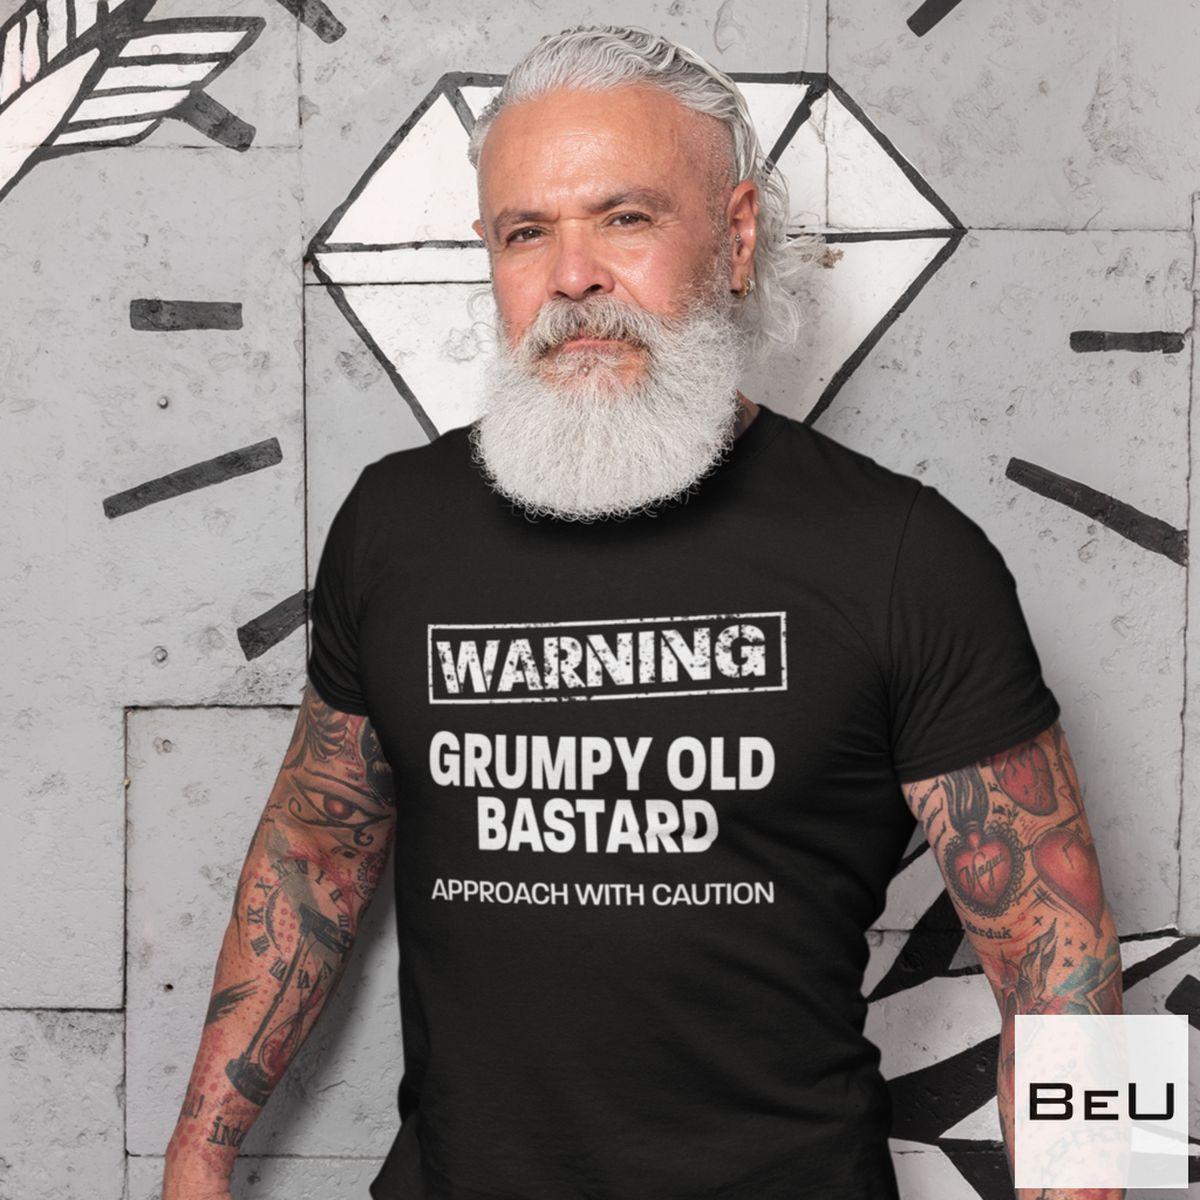 Grumpy Old Bastard Approach With Caution Shirt